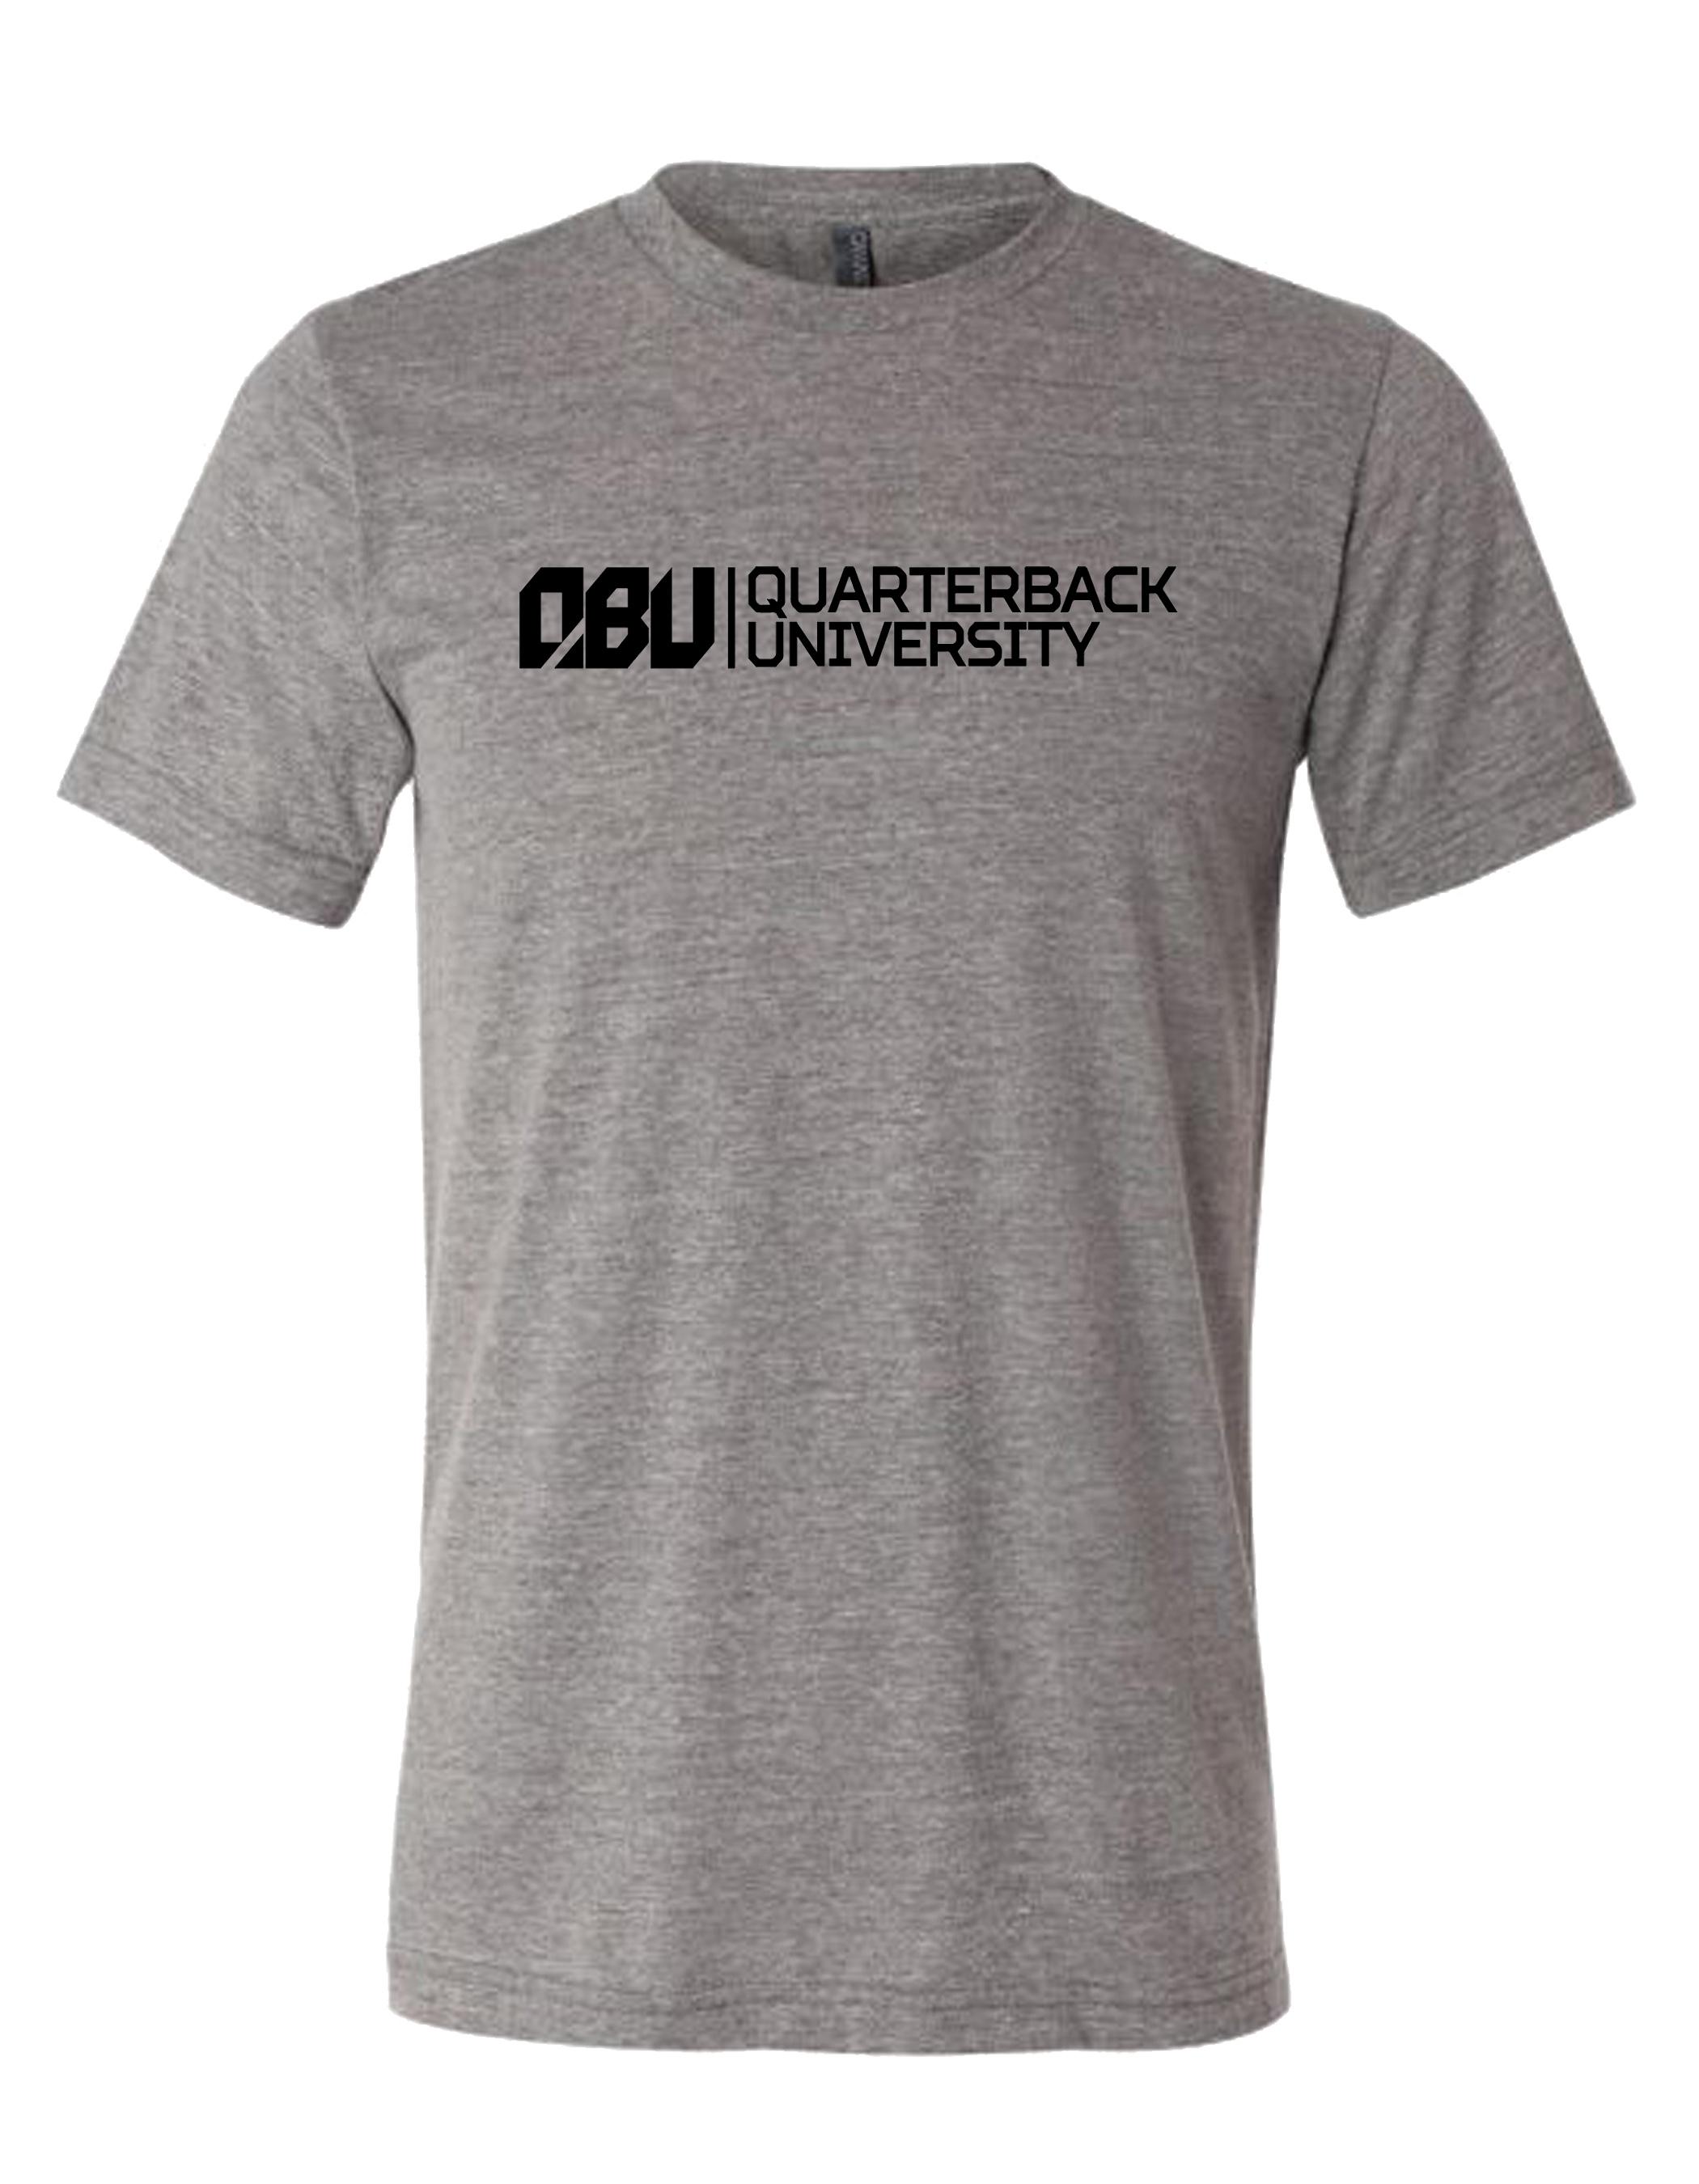 Quarterback University Tee Grey